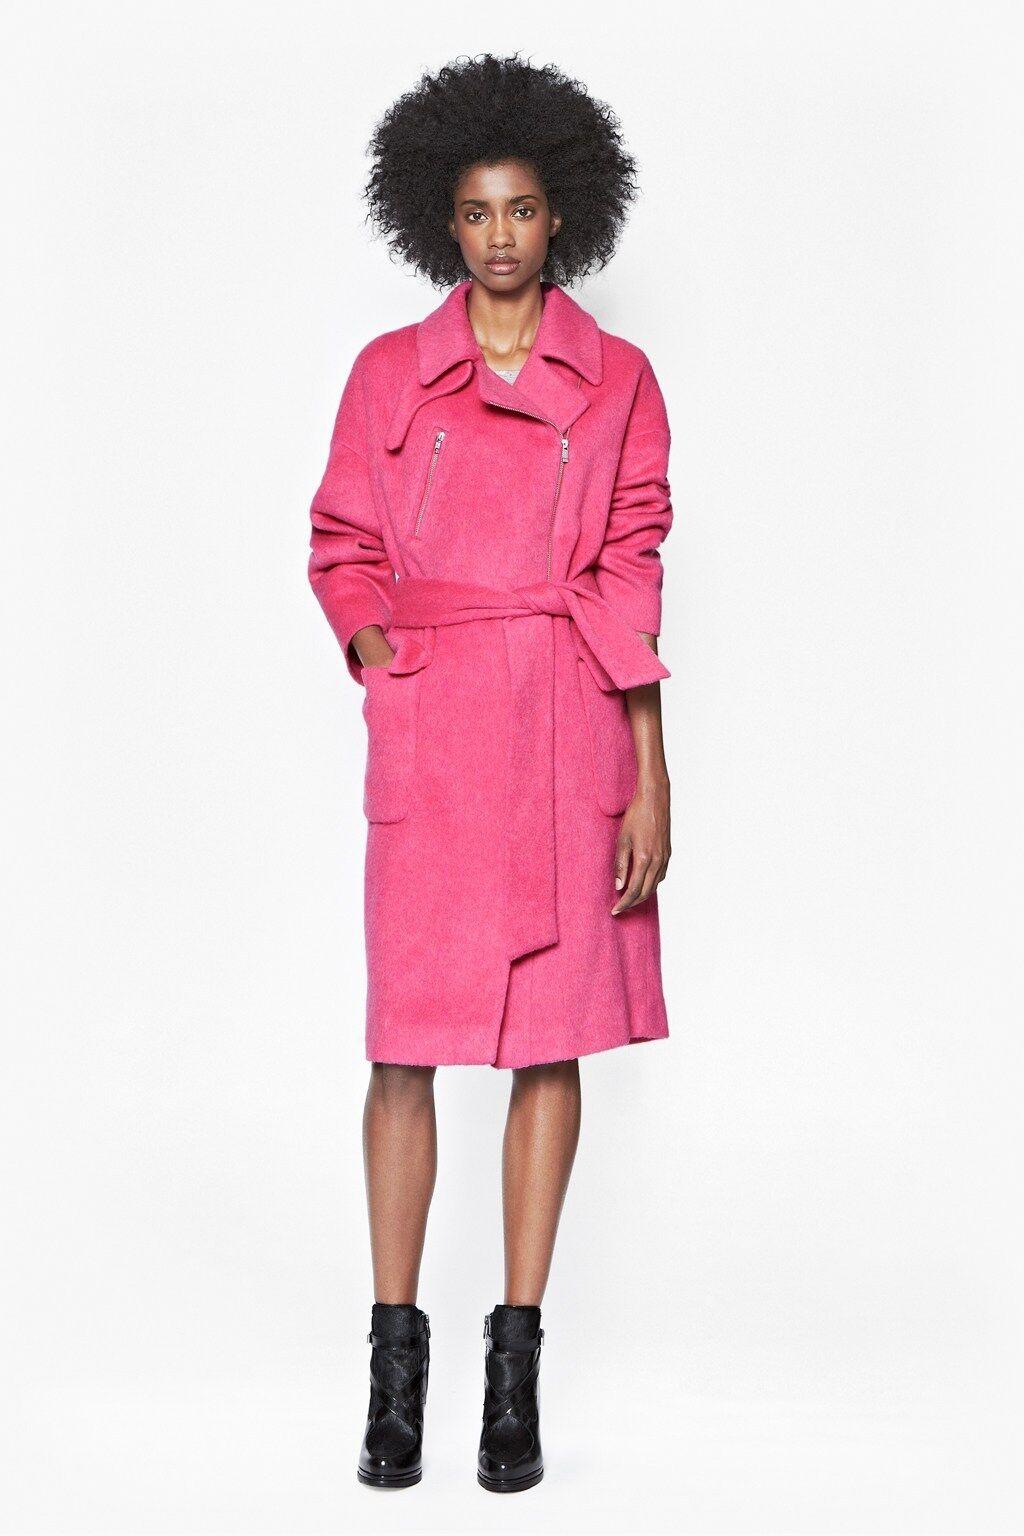 French Connection Pink Emma pink Wool Coat (Mantel), 12 40, FCUK, zipper + belt